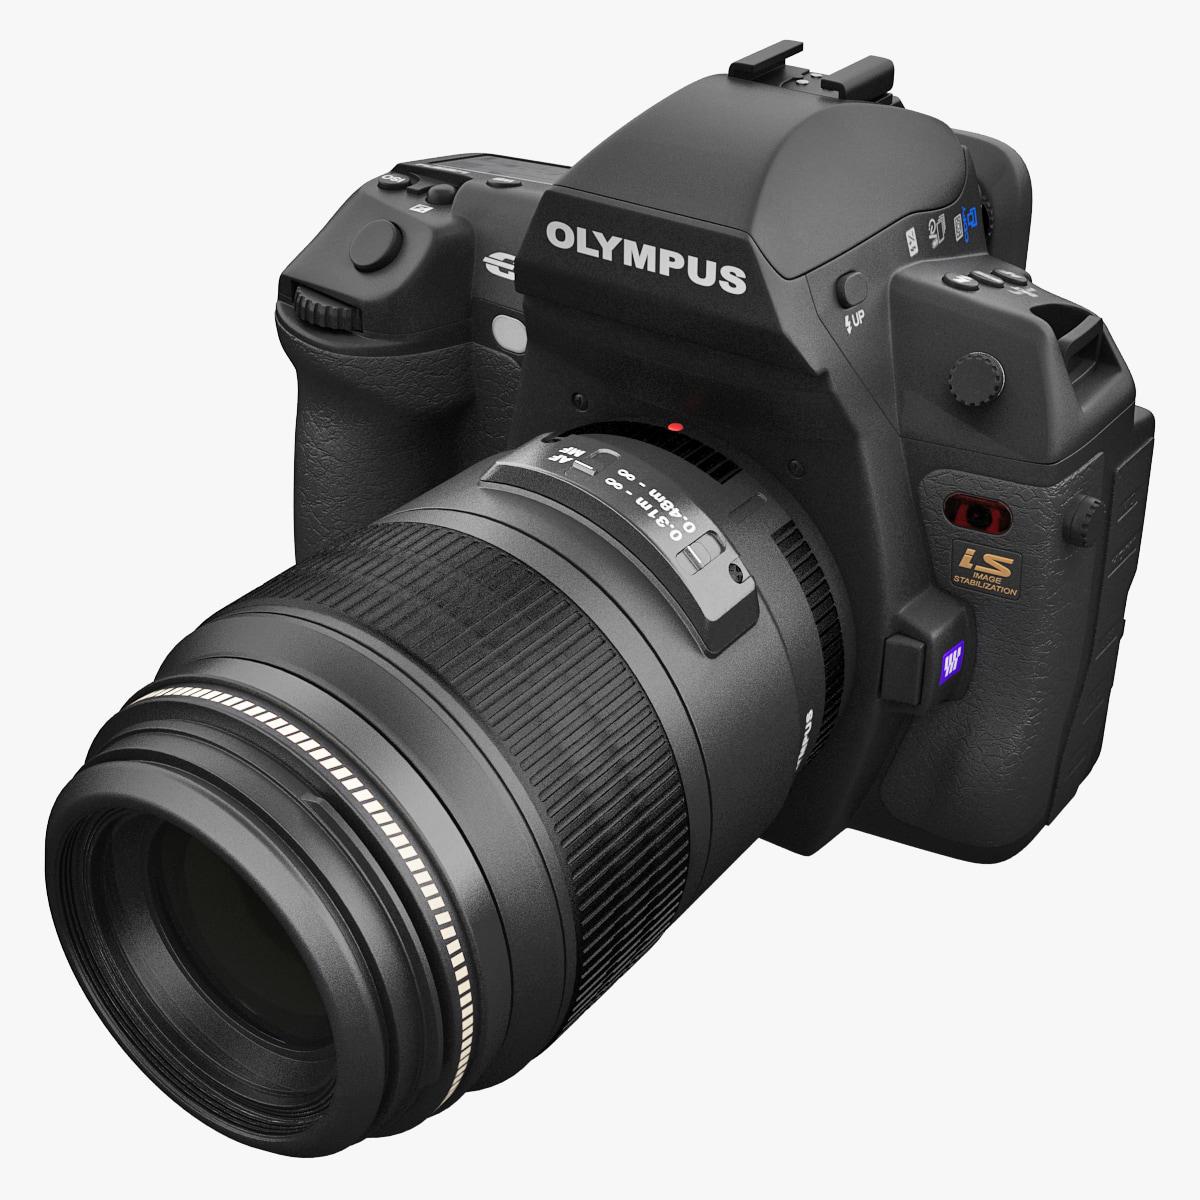 Olympus_E5_0000_2.jpg